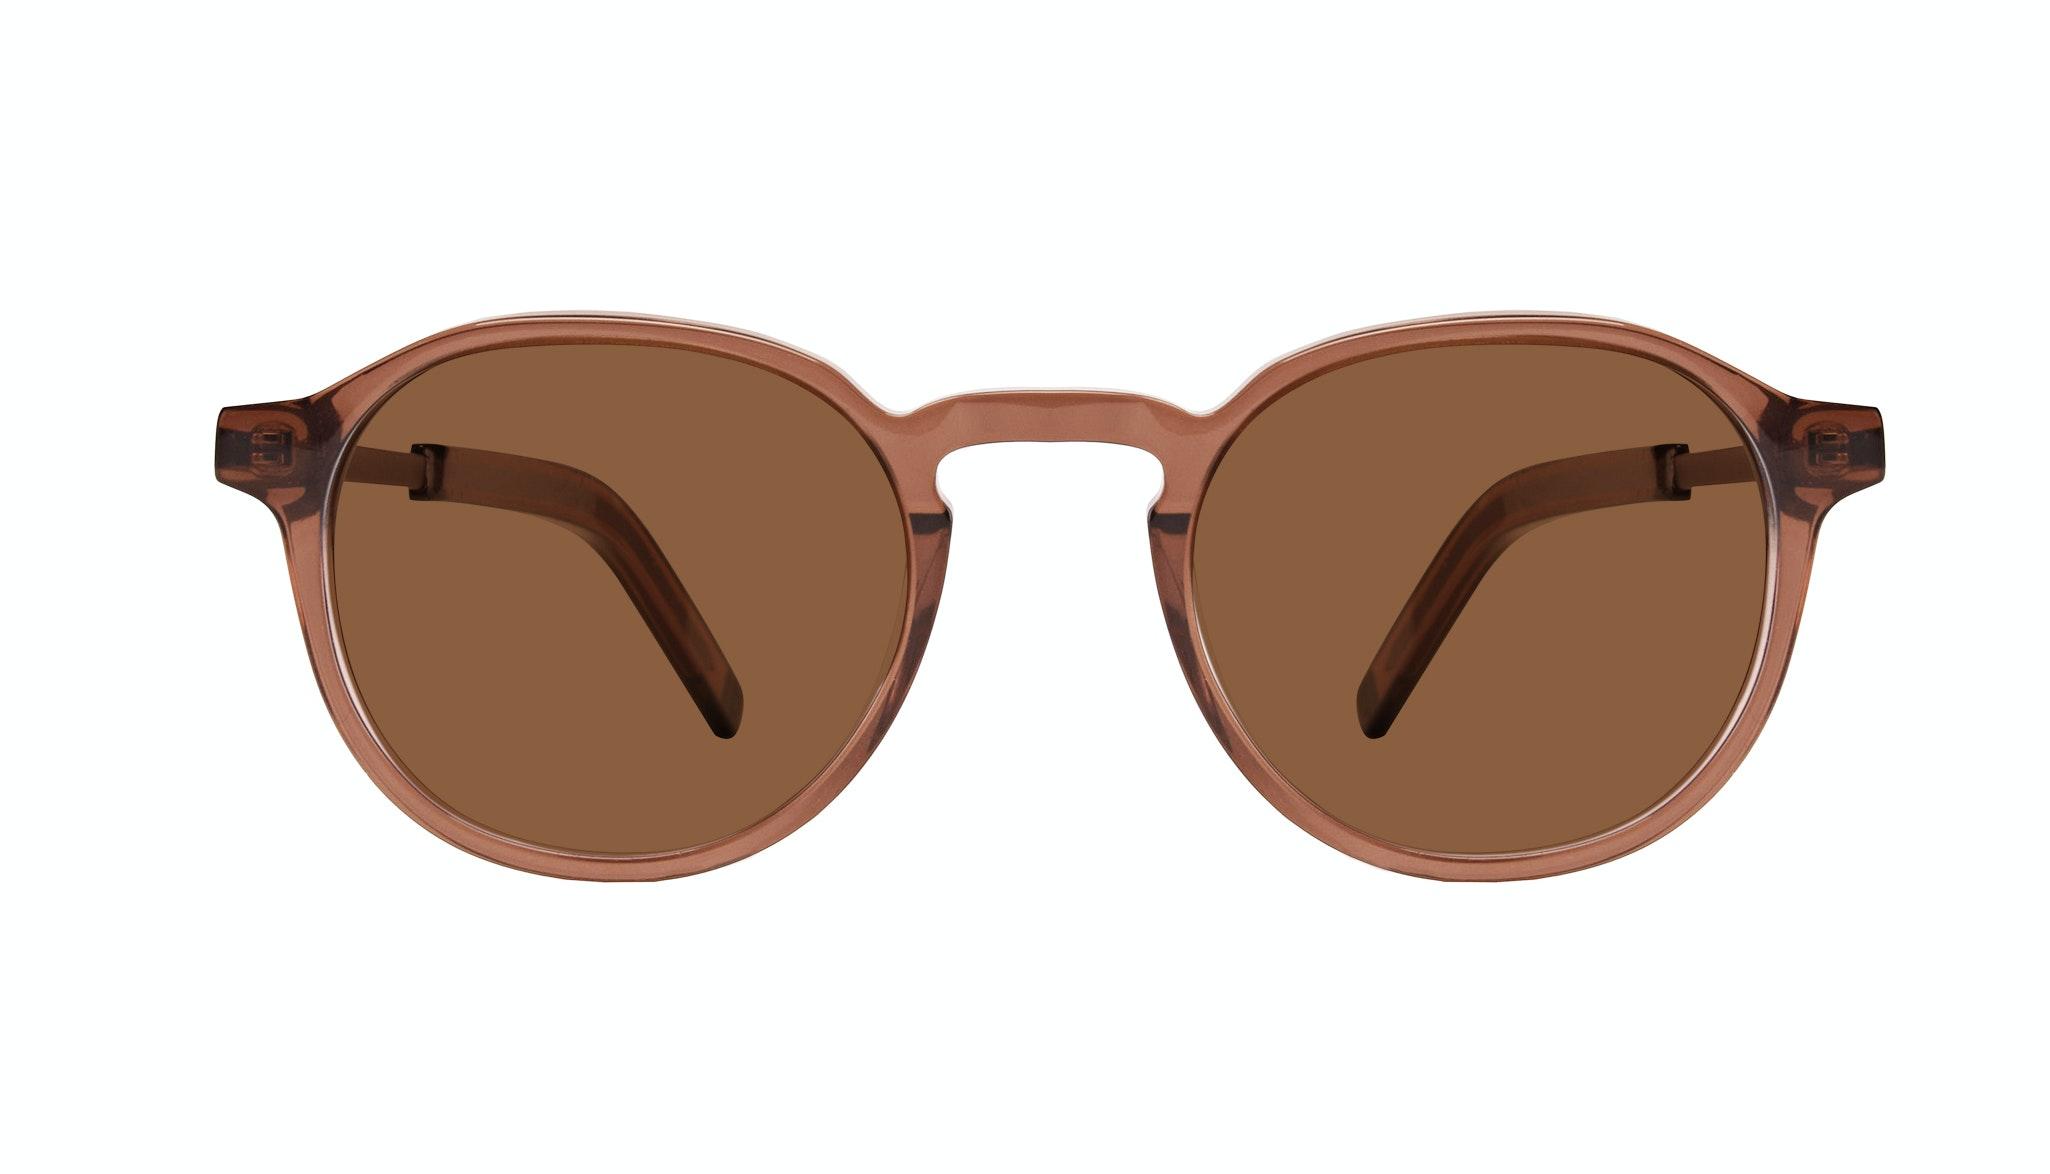 Affordable Fashion Glasses Round Sunglasses Men Prime XL Terra